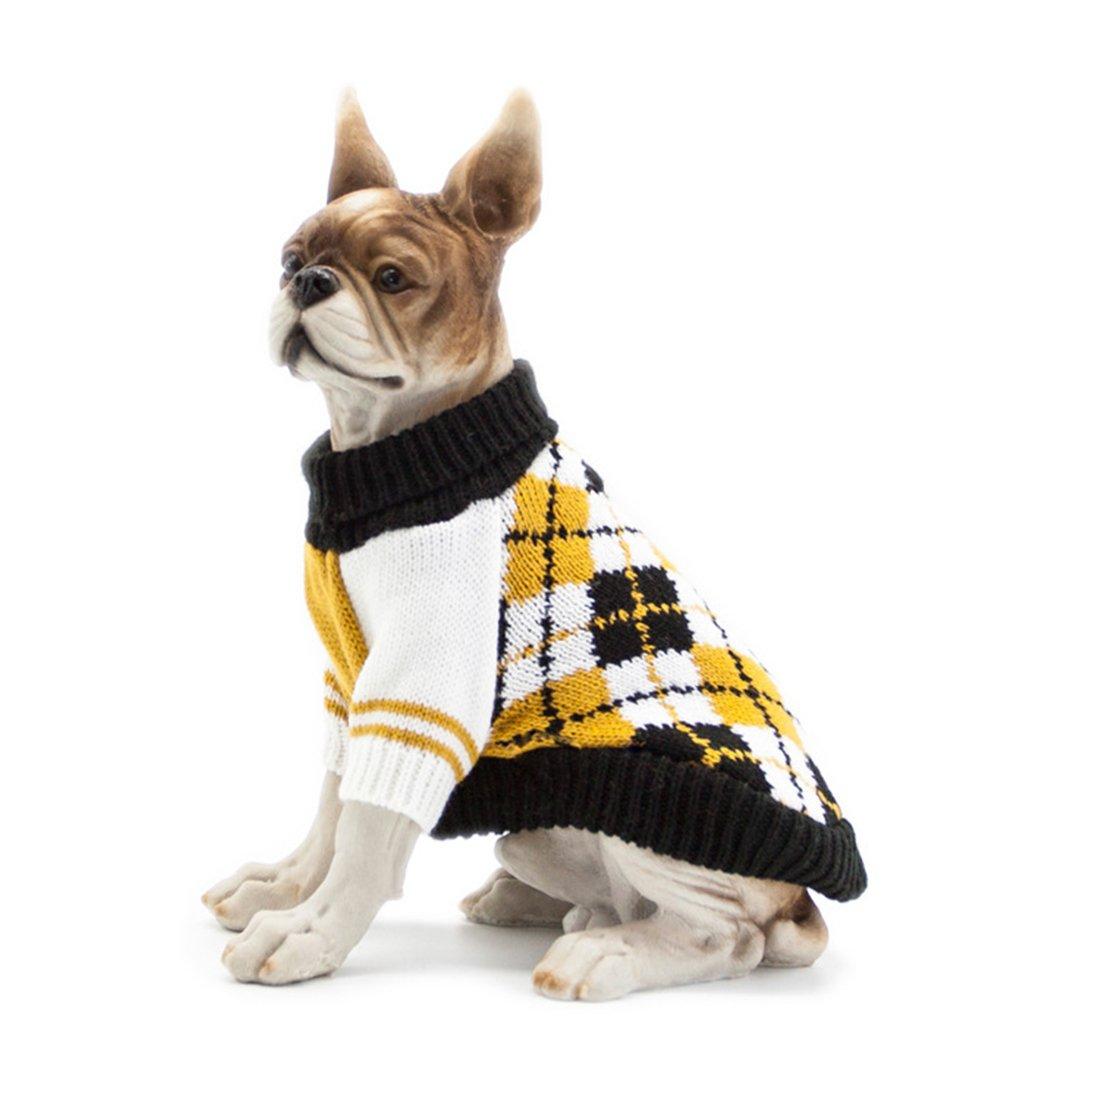 Scheppend Dog Pullover Jumpers Sweater Knit Pet Argyle Turtleneck Knitwear Winter Warm Coat Orange S WLARG7